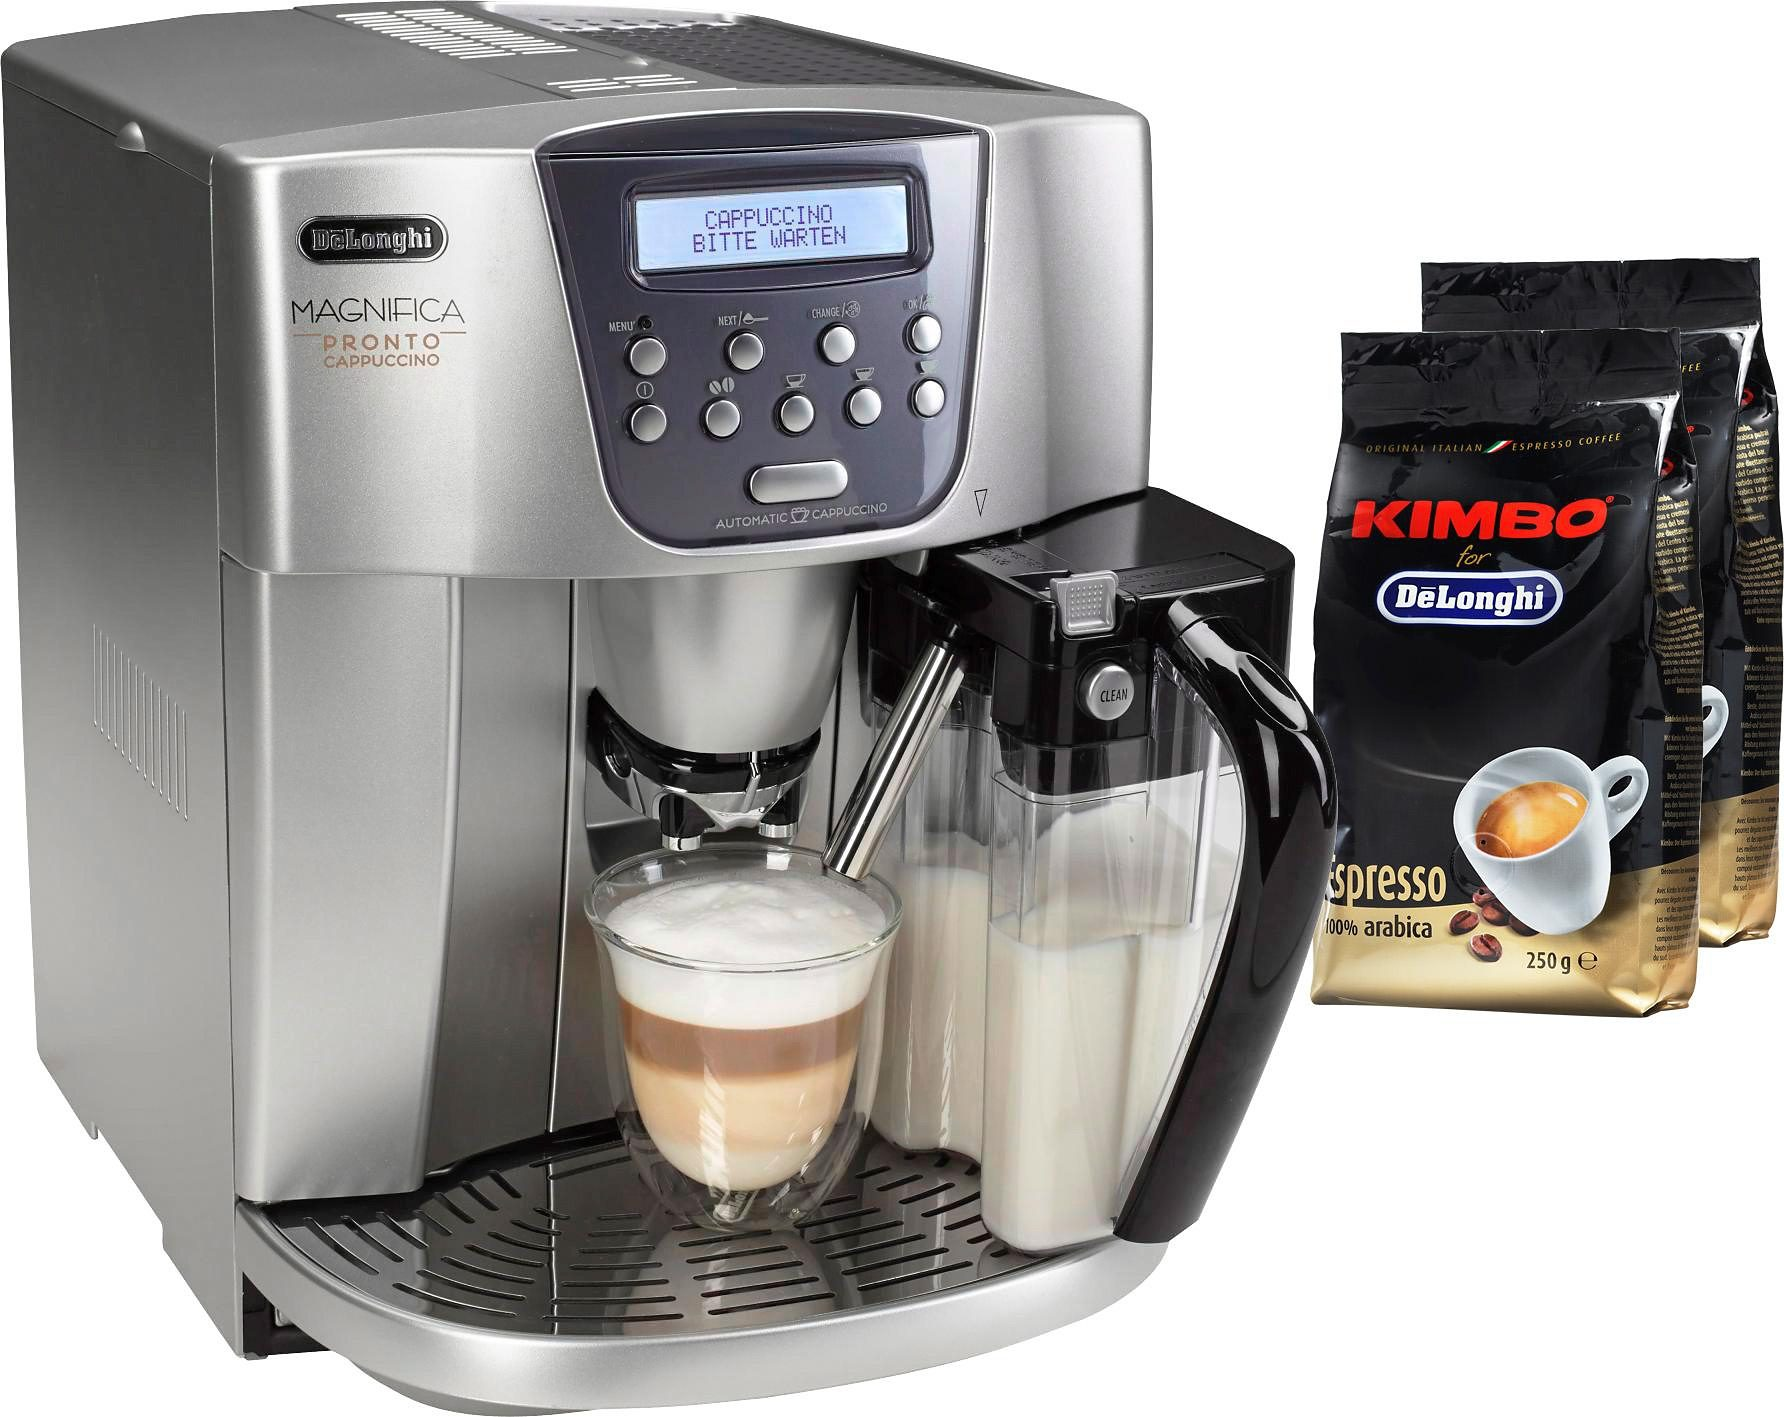 De'Longhi Kaffeevollautomat Magnifica ESAM 4500, 1,8l Tank, Kegelmahlwerk, Milchschaumdichte einstellbar